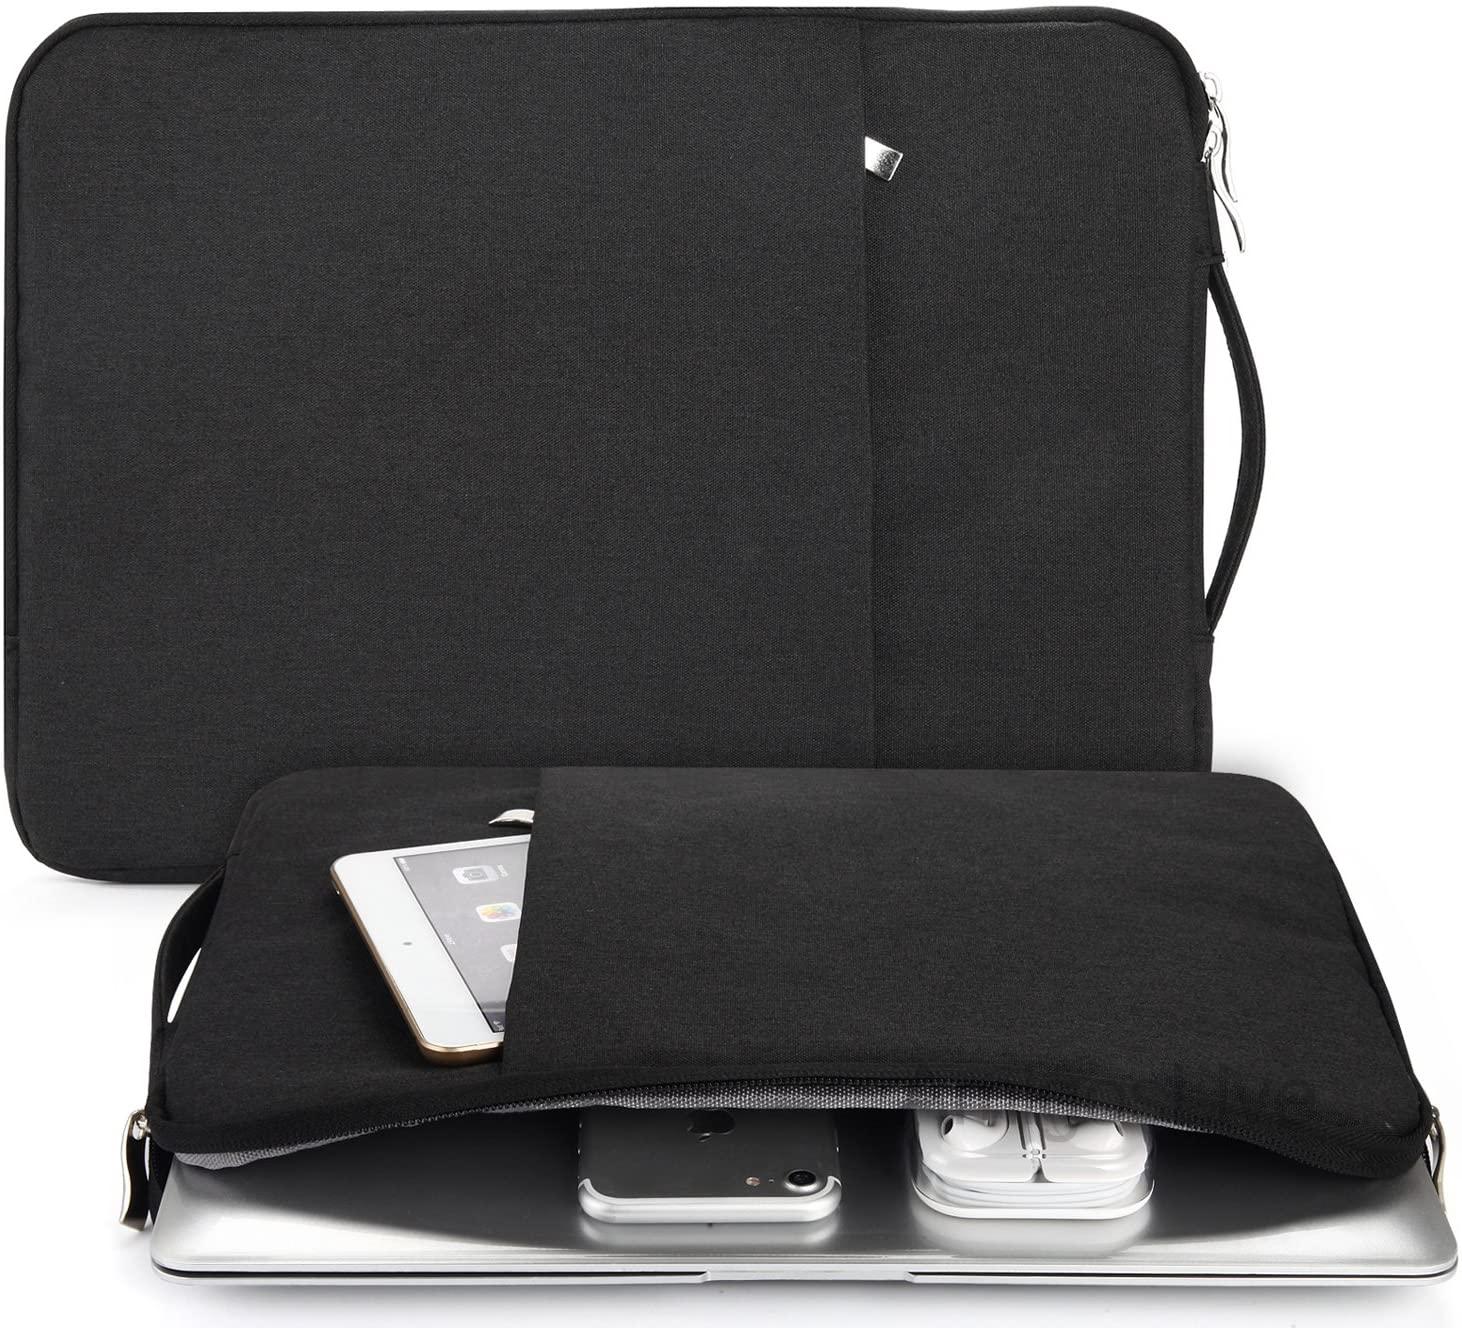 Handbag Sleeve Case For Huawei matebook Xpro 13.9 2020 13 14 D14 D15 15.6 Waterproof Zipper Pouch Bag Cover MagicBook Pro 16.1